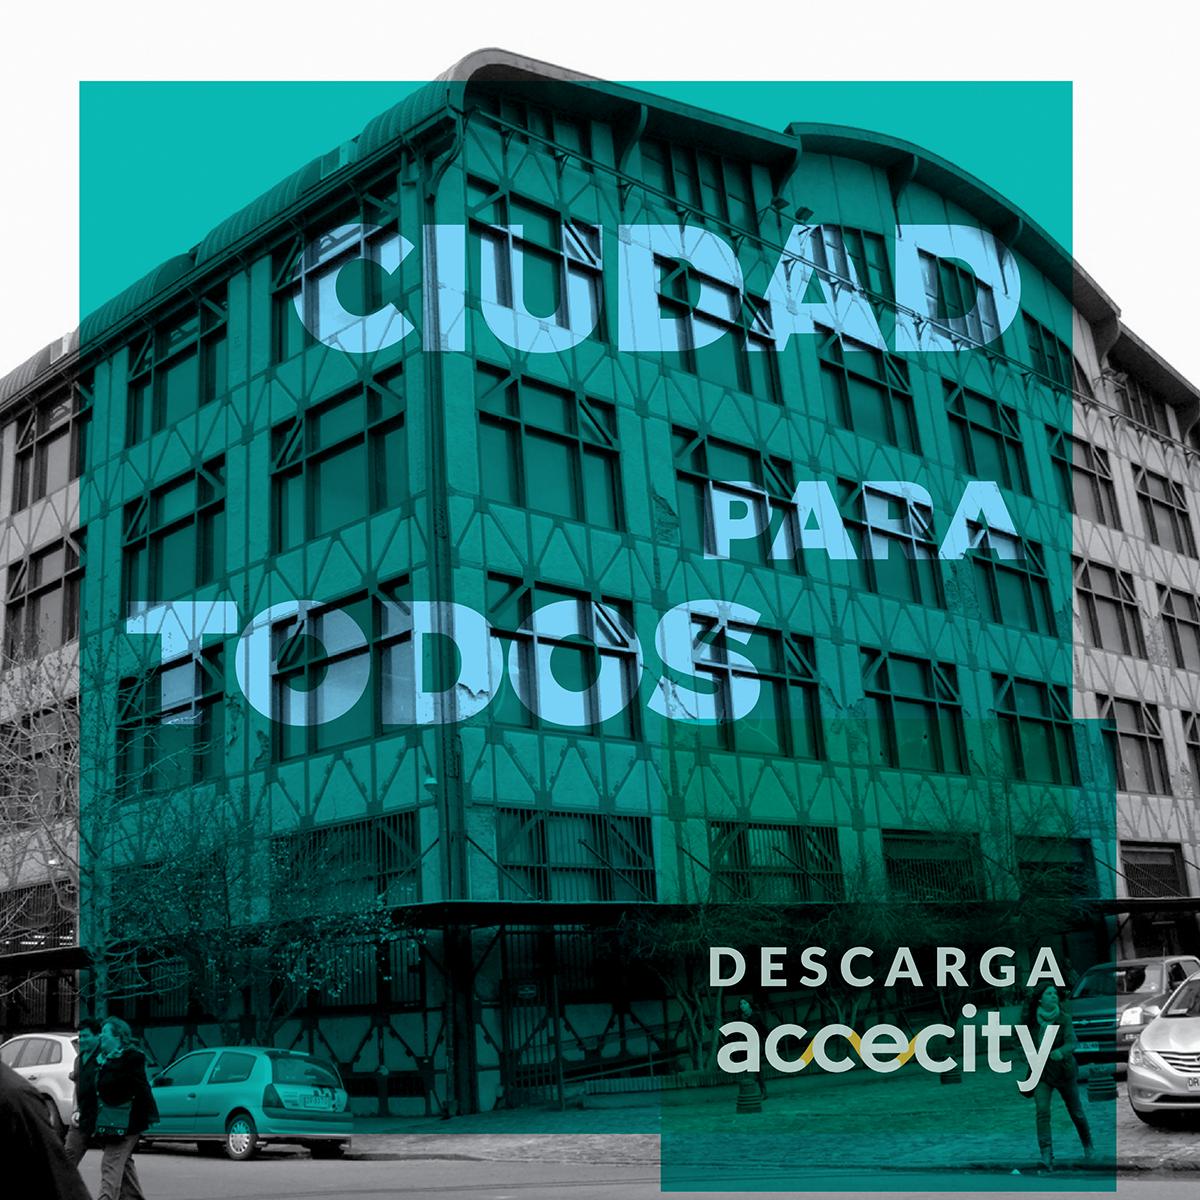 app urbanism   SmartCity accesibility